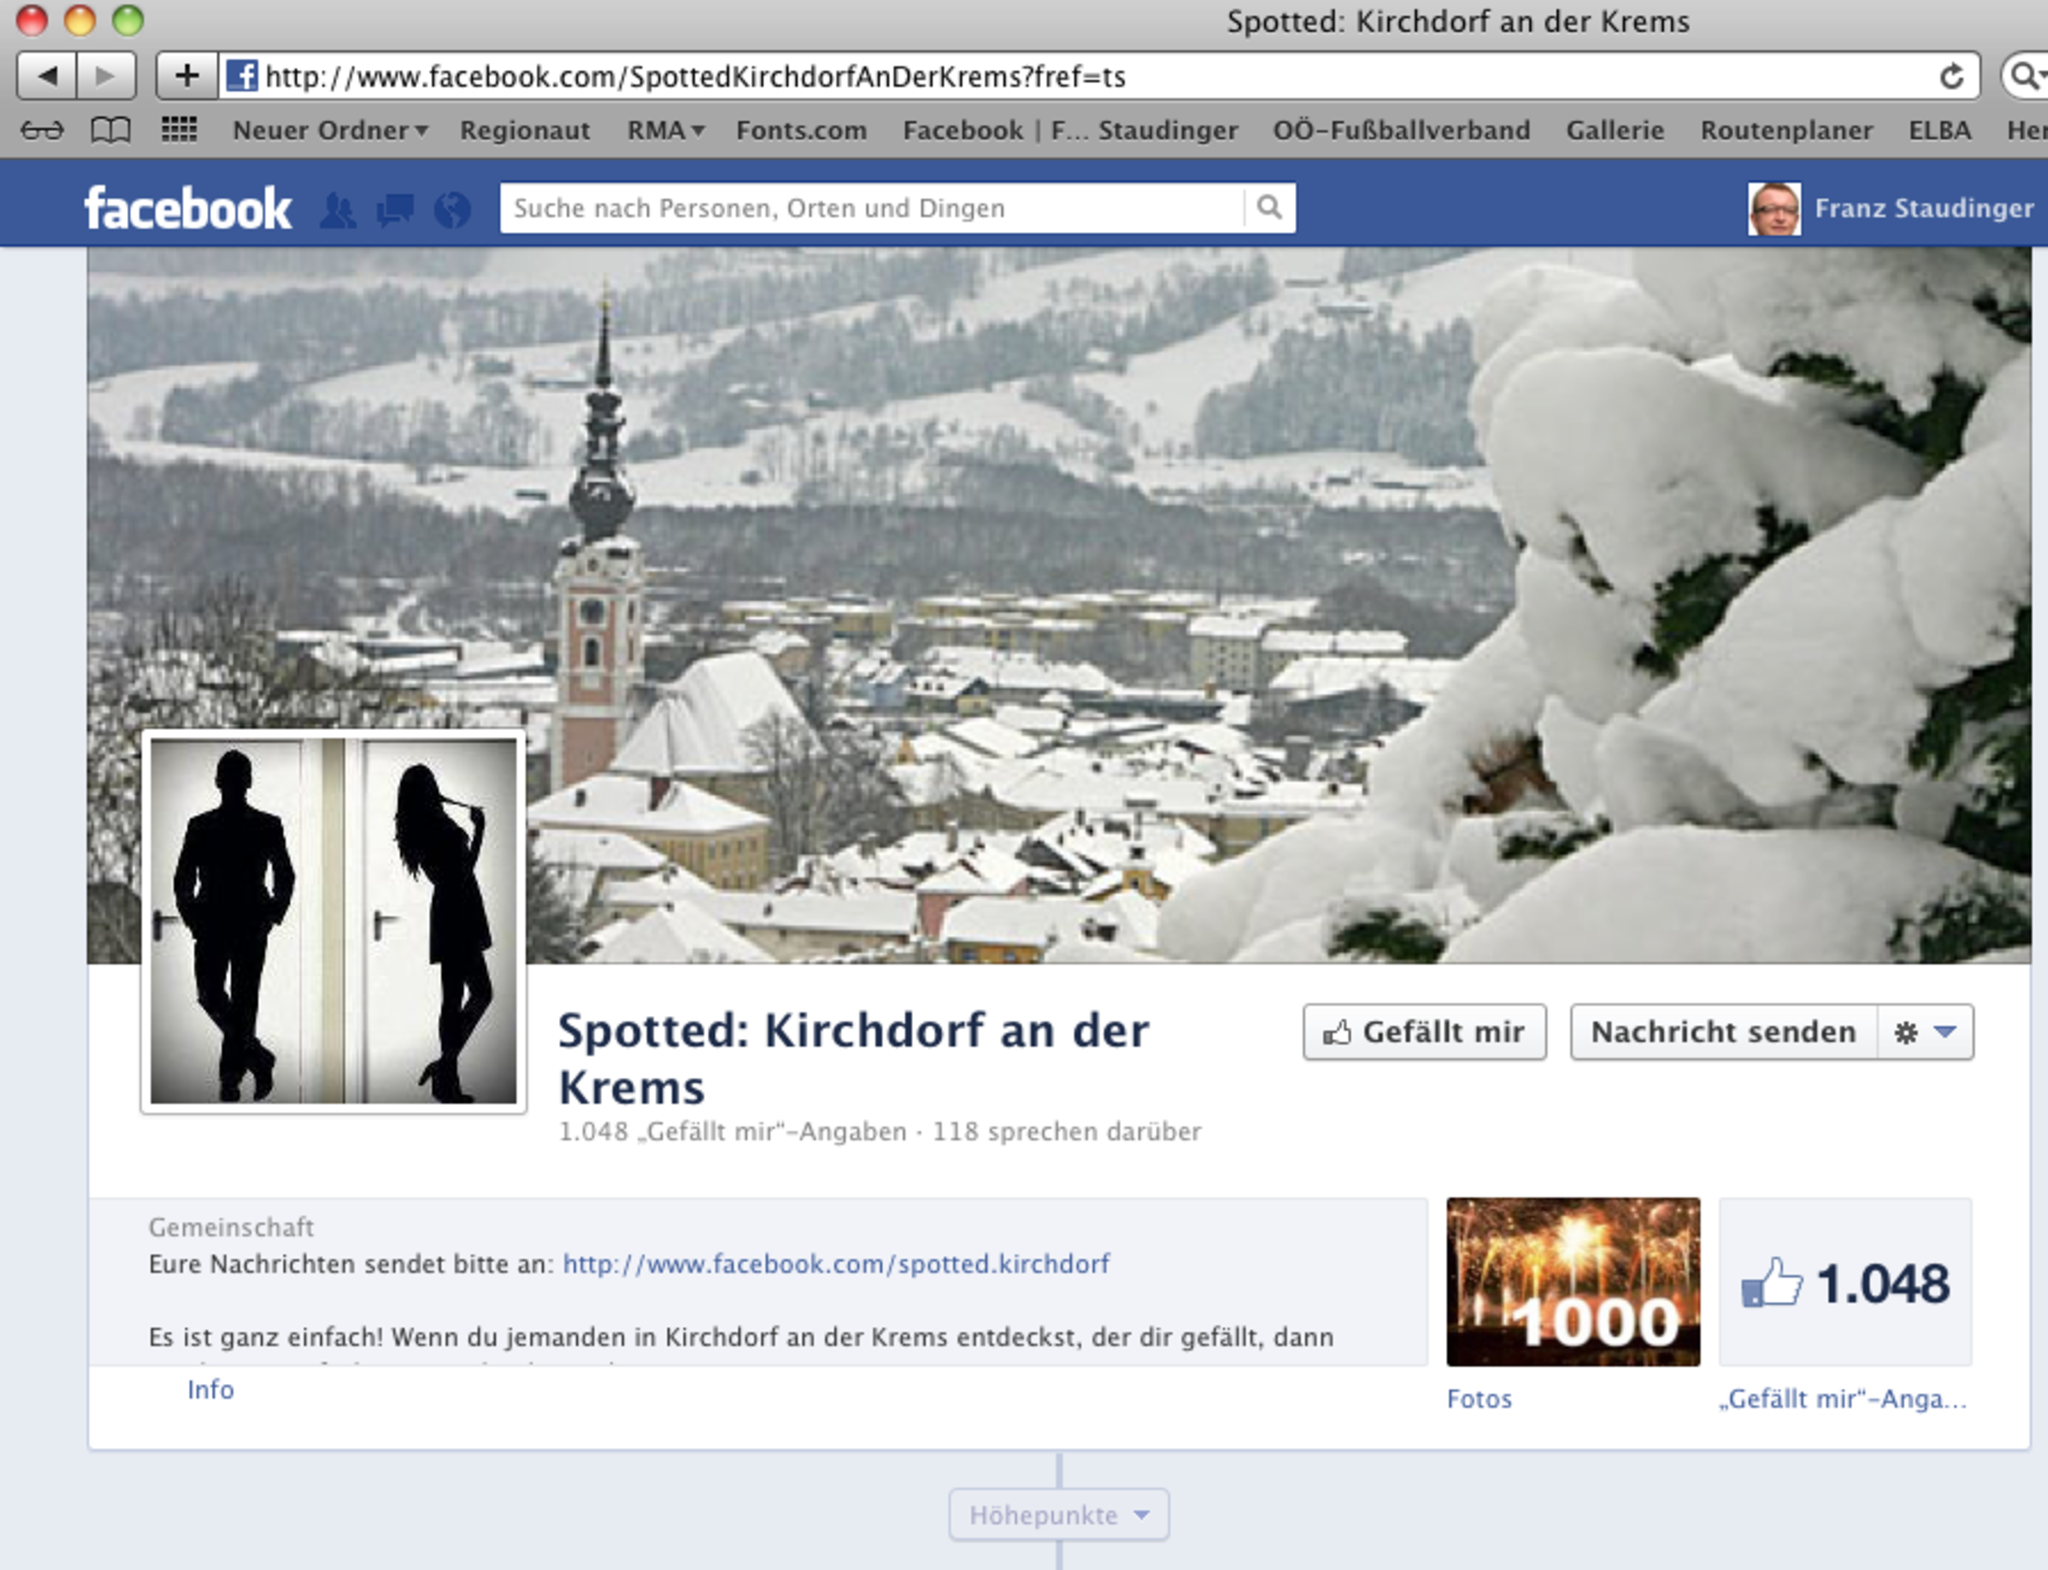 Partnersuche Mit Kontaktanzeigen Kirchdorf An Der Krems